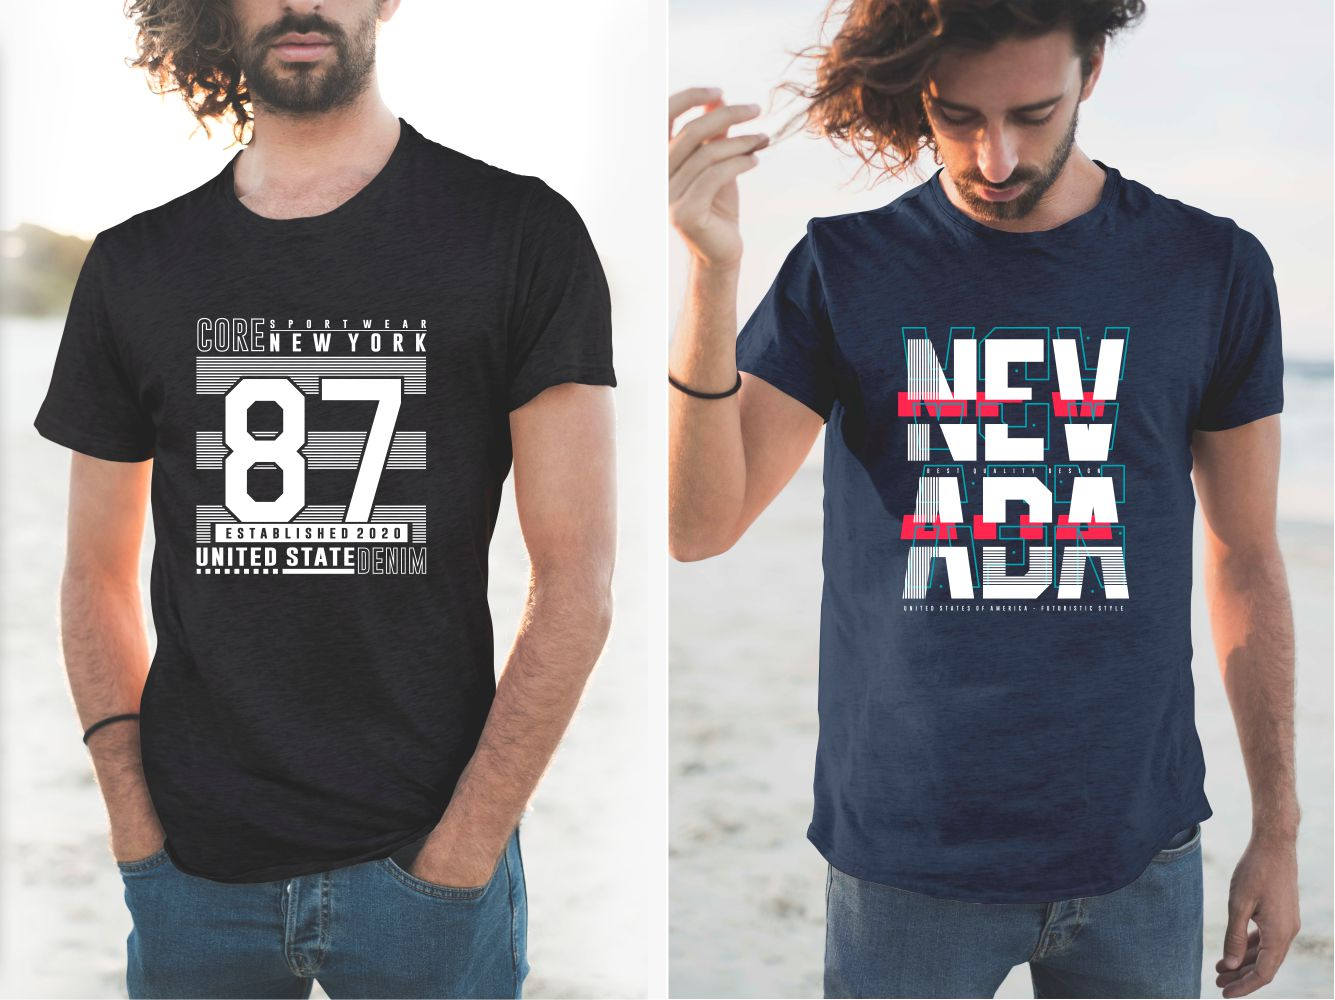 106 Urban T-shirt Designs Collection - 23 1